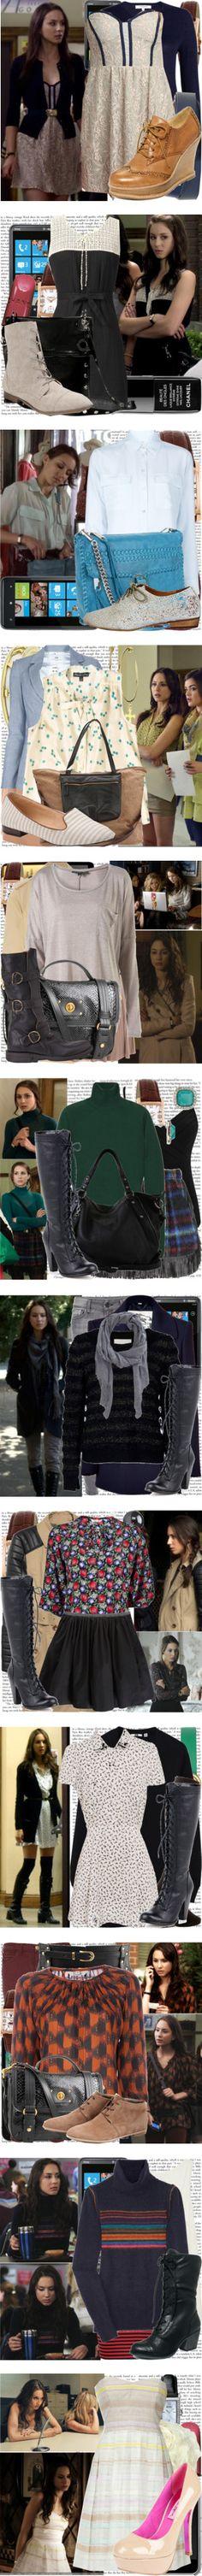 pll style I (spencer) by vitaetamor liked on Polyvore http://felisa.uk/